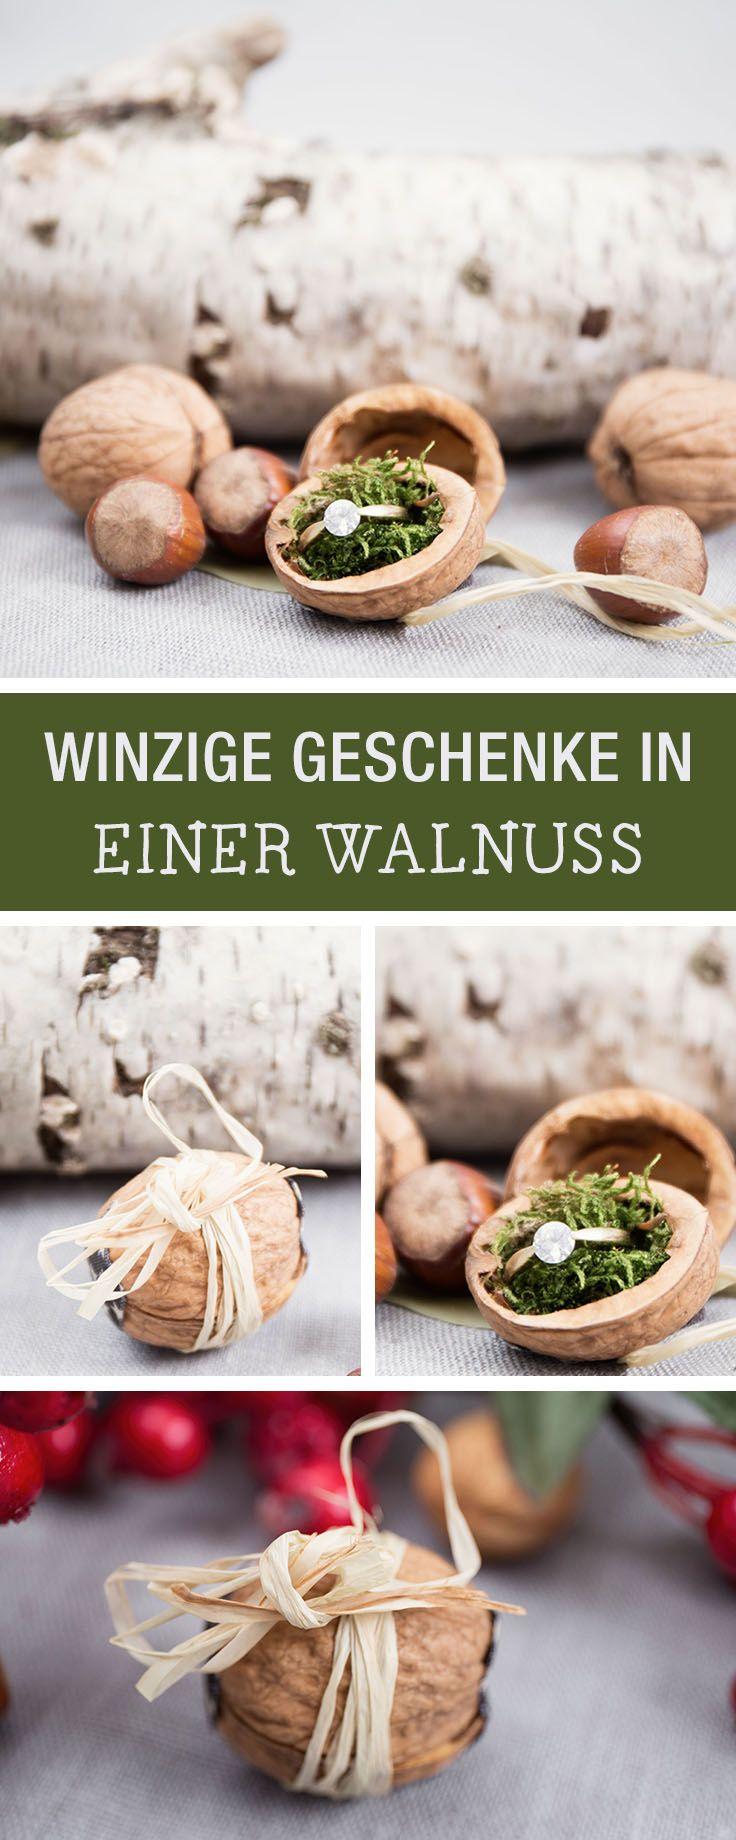 Schmuck schön verpacken: Walnuss als Geschenkverpackung nutzen / cute gift wrapping idea: use a walnut to wrap jewelry, upcycling via DaWanda.com